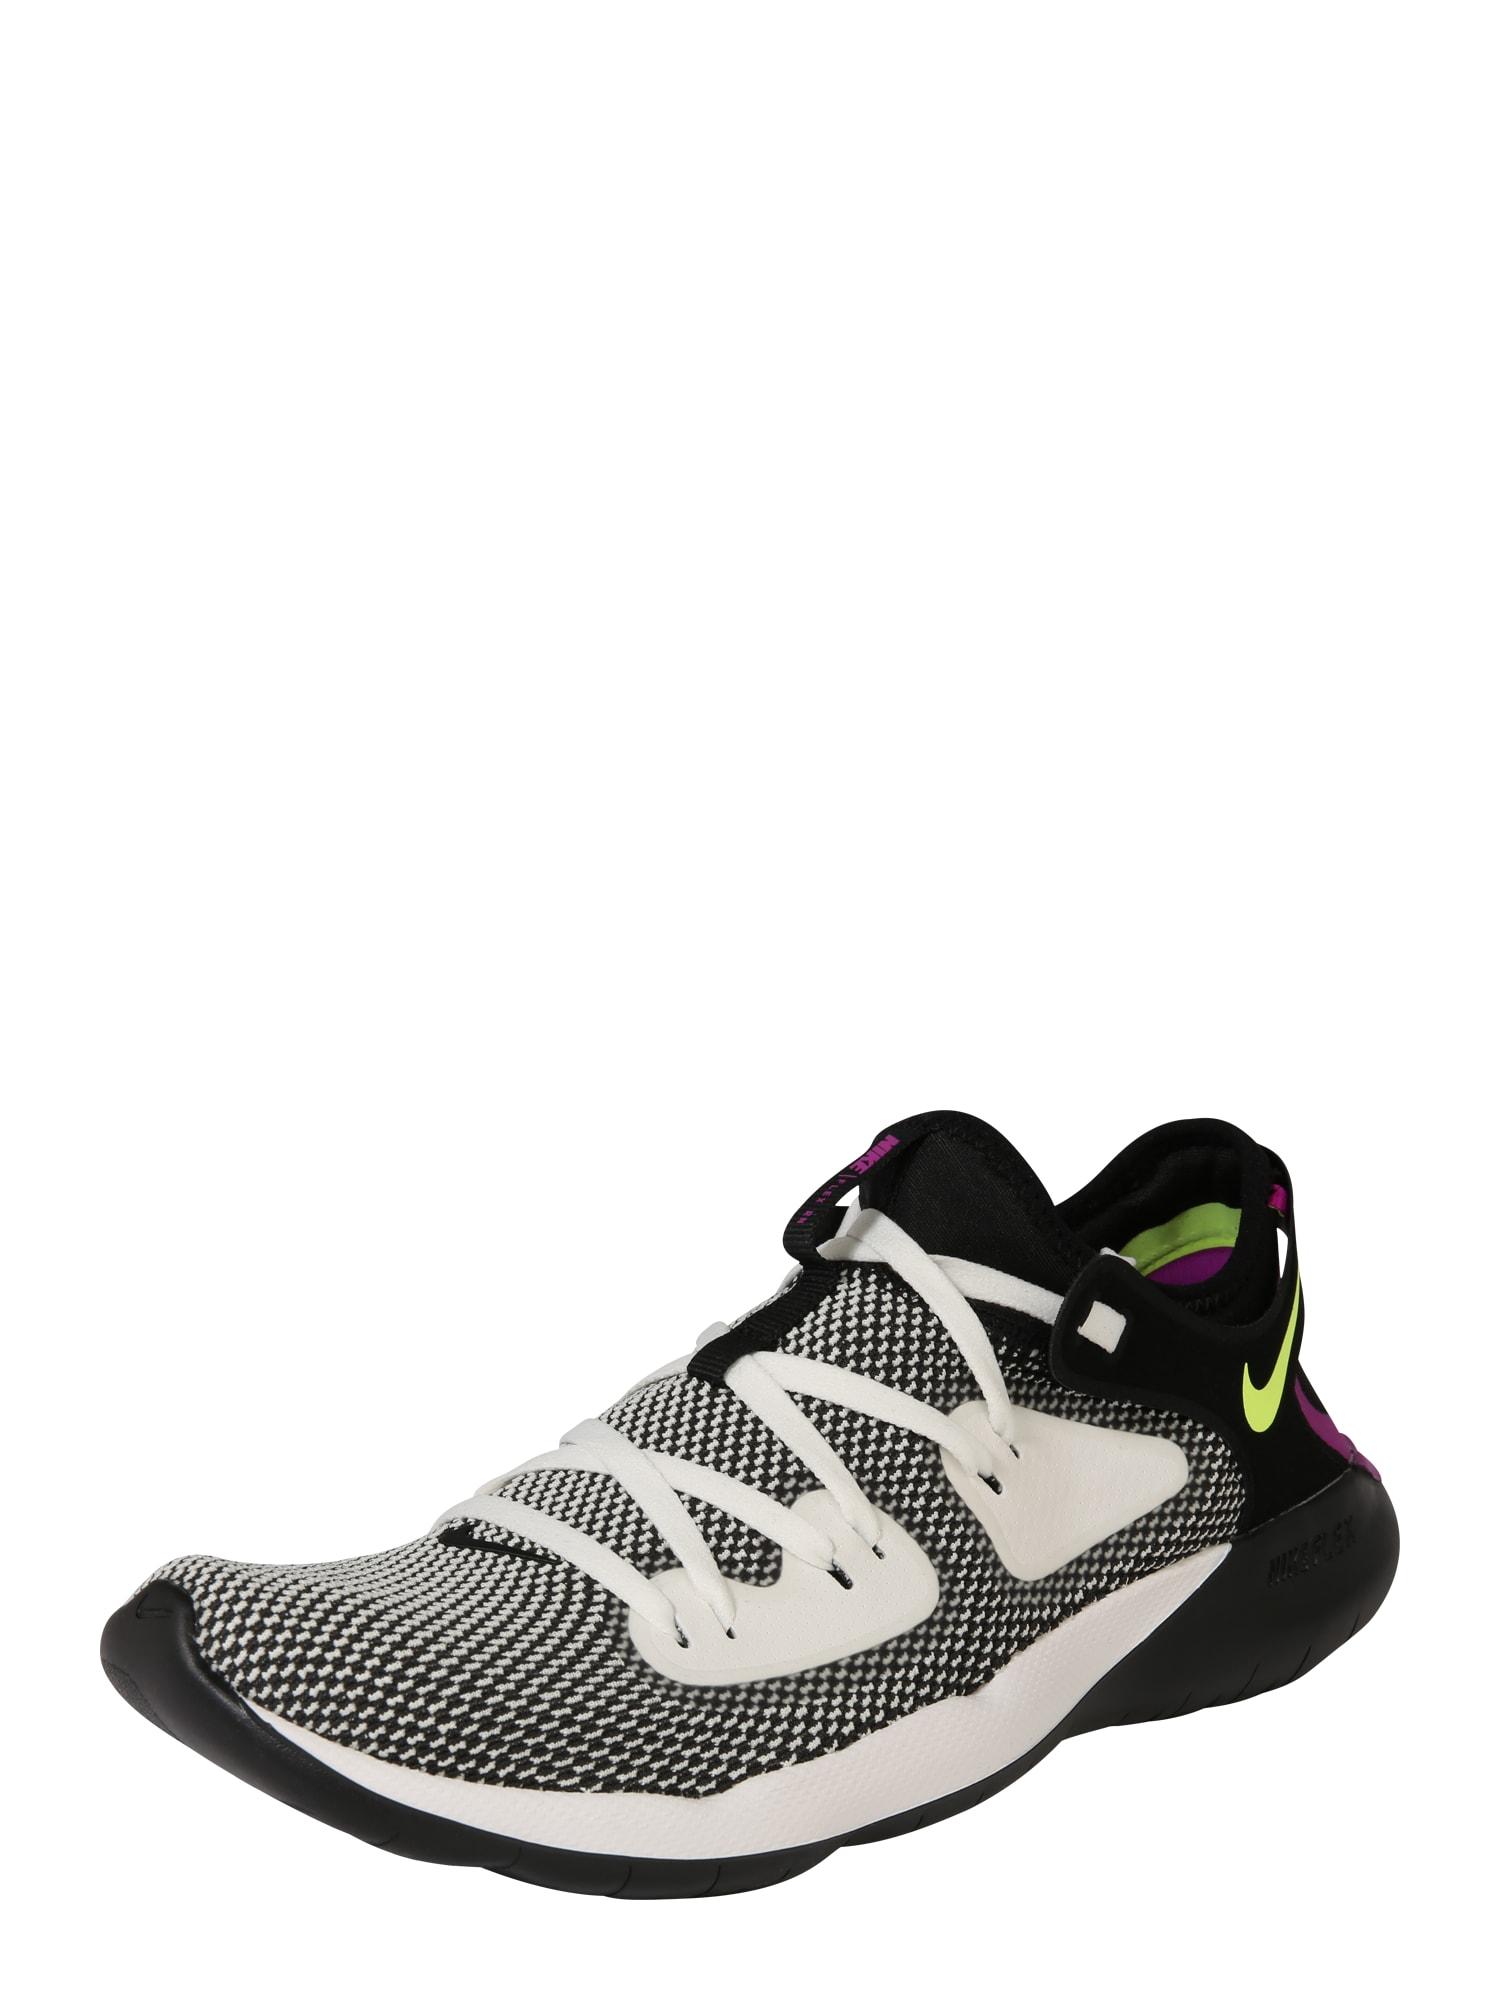 NIKE, Heren Loopschoen 'Nike Flex 2019 RN', grijs